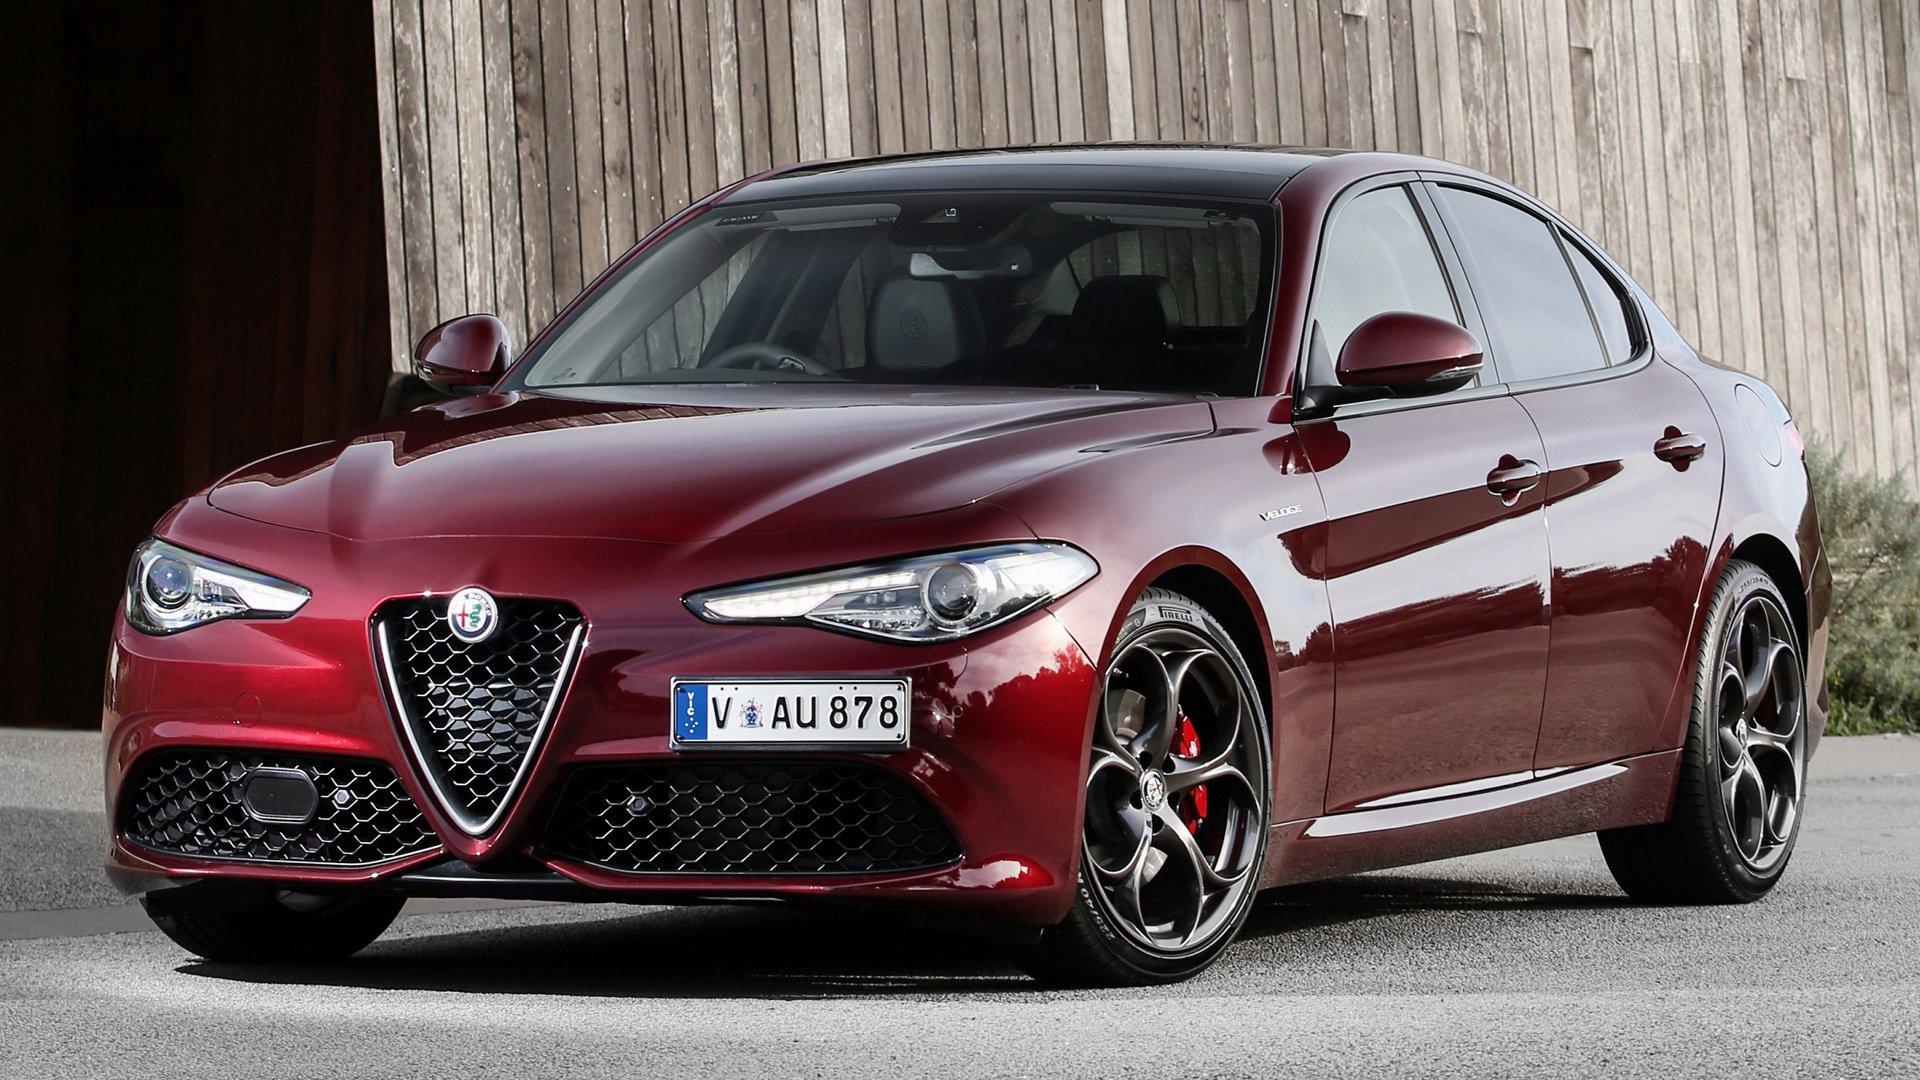 2017 Alfa Romeo Giulia Veloce Hd Wallpaper Background Image 1920x1080 Id 960395 Wallpaper Abyss